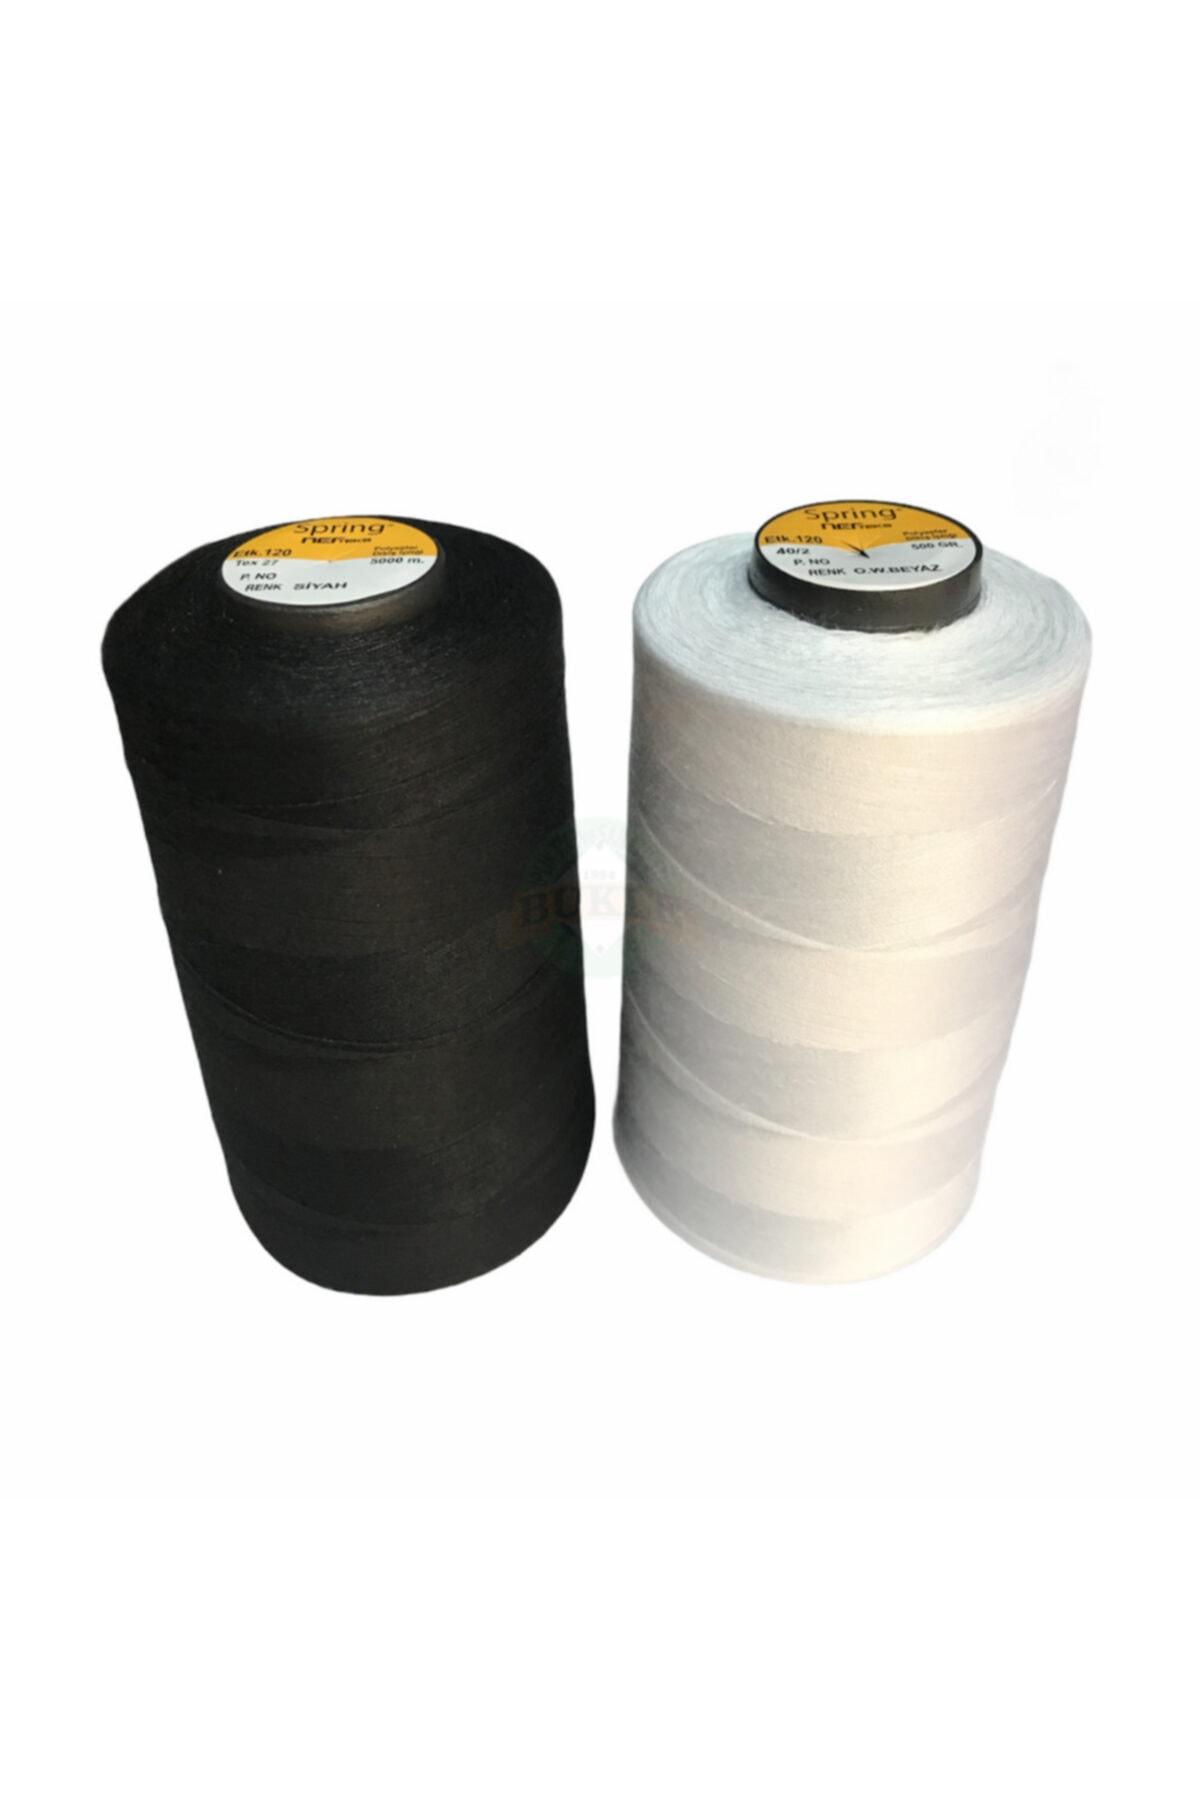 120 No 5000 Mt Siyah Ve Beyaz Polyester Dikiş Ipliği (2 ADET)